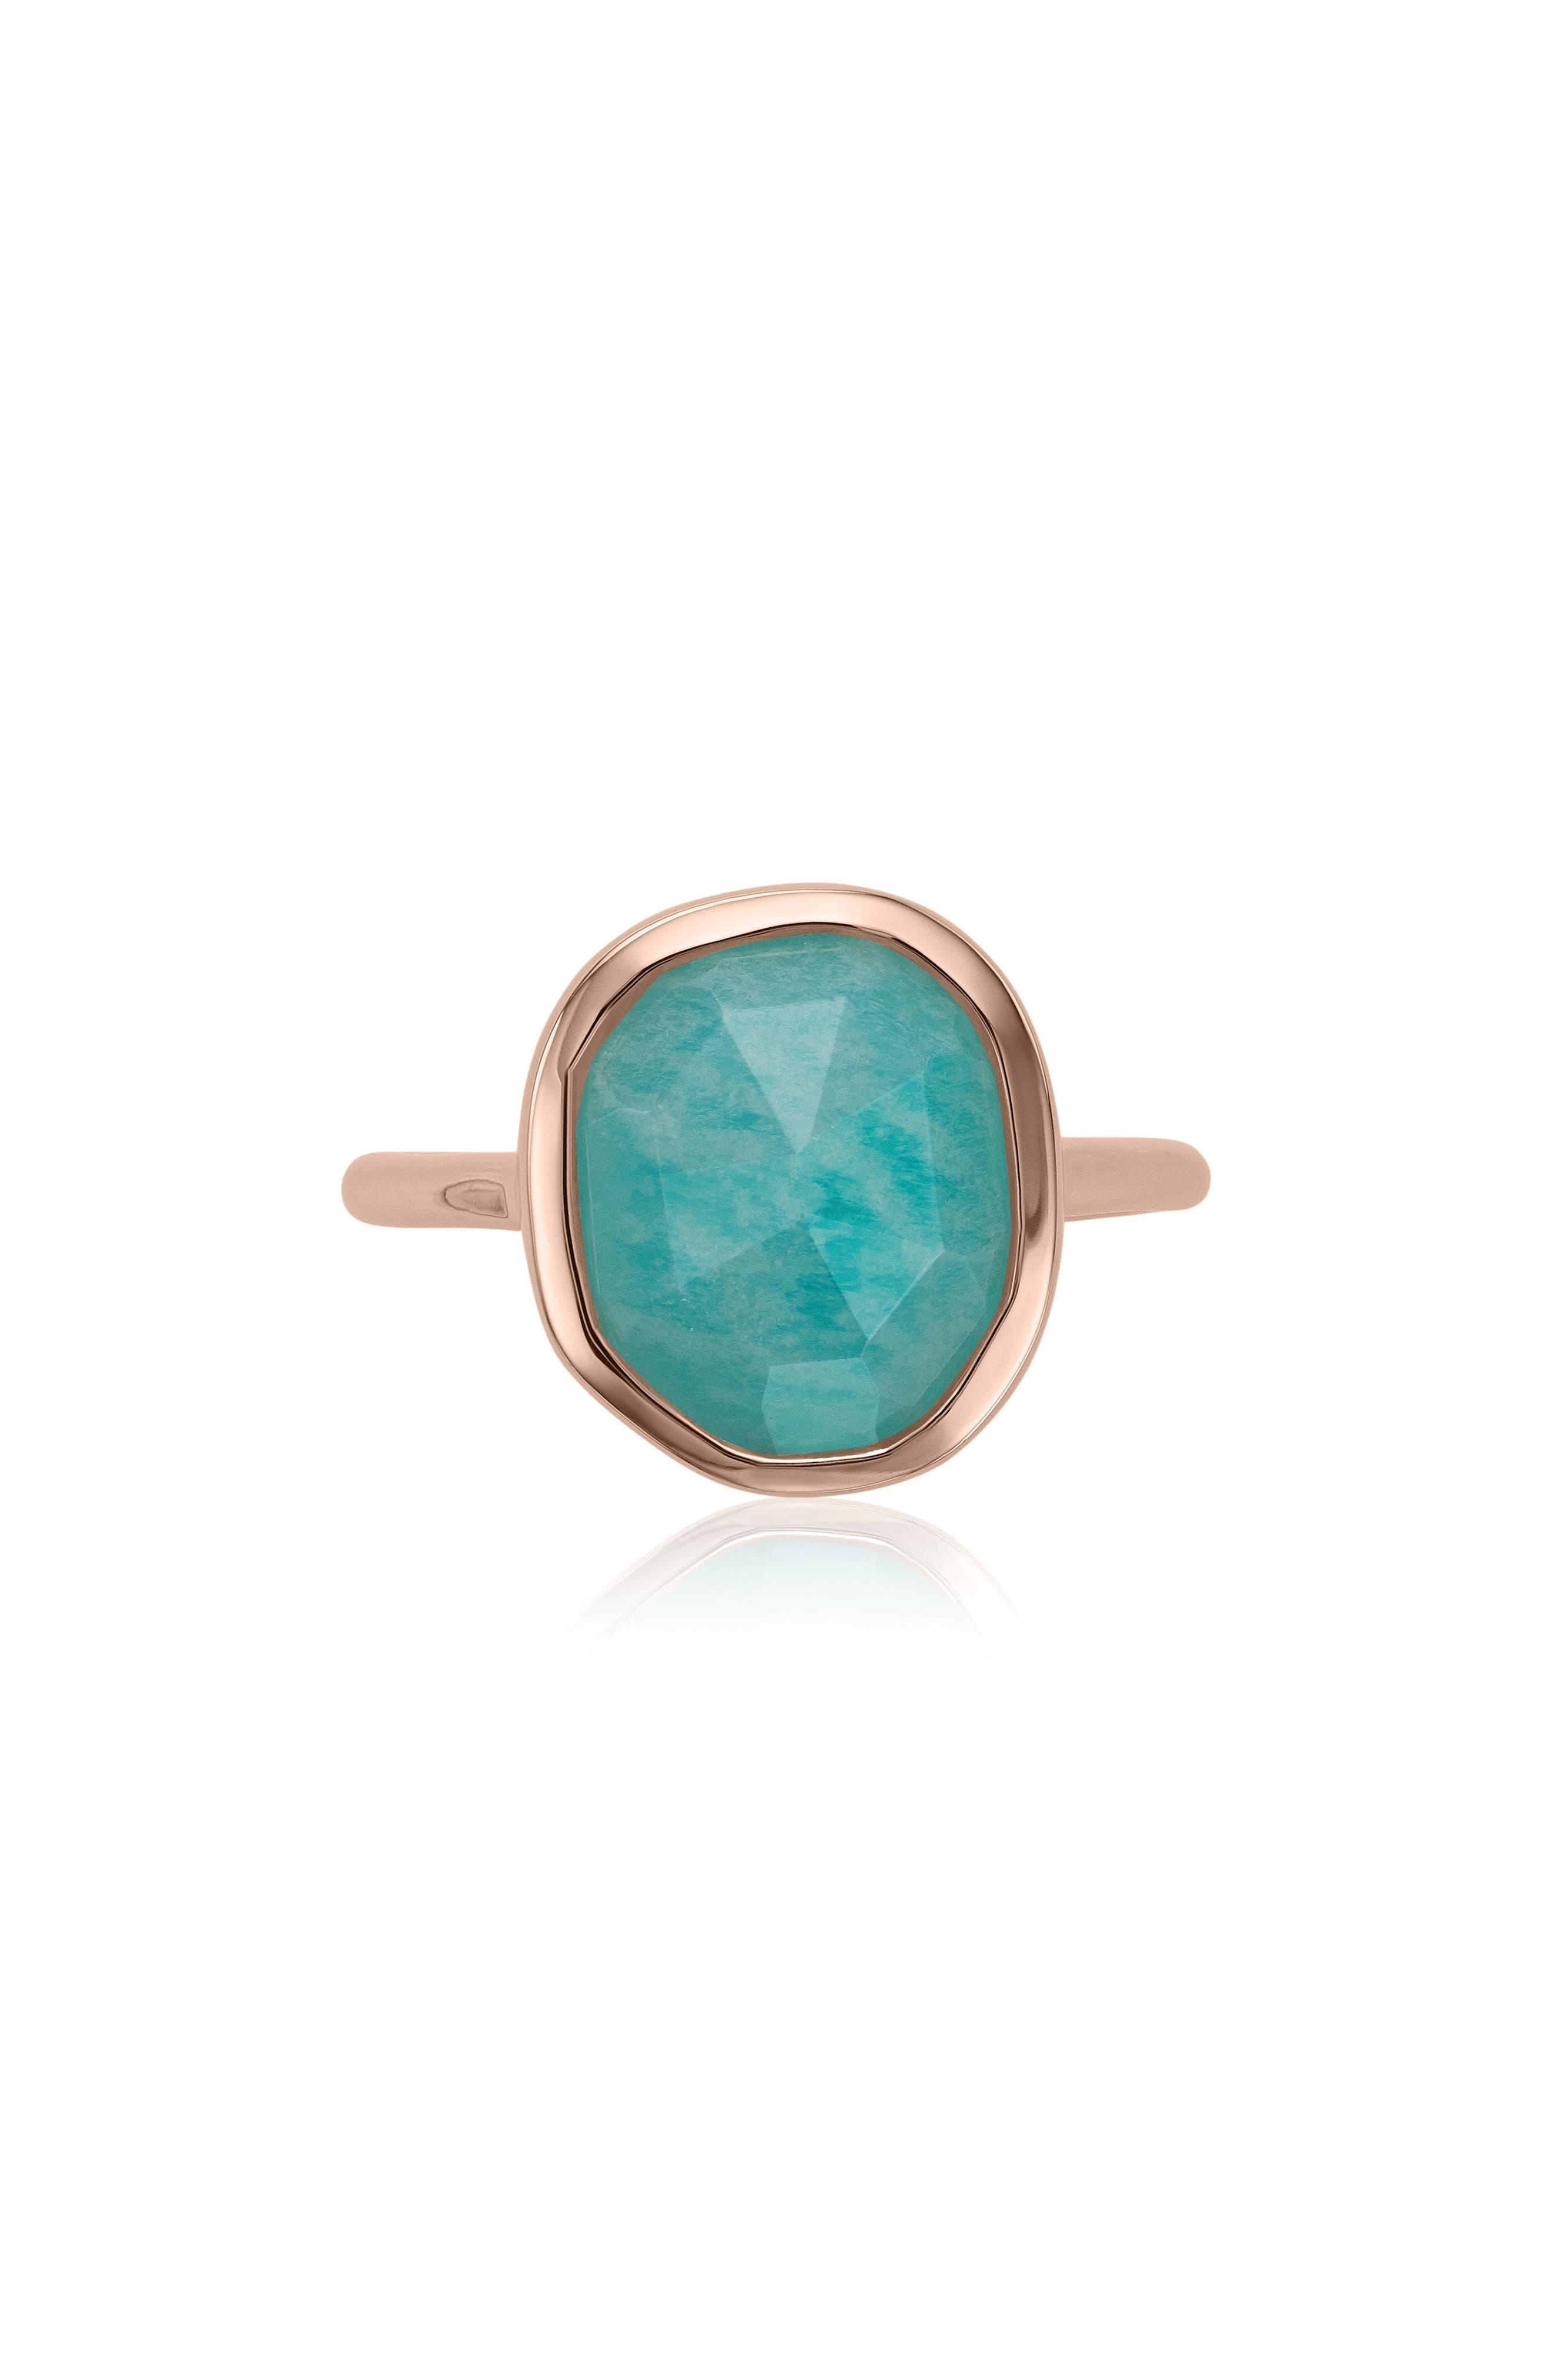 Alternate Image 1 Selected - Monica Vinader Siren Nugget Semiprecious Stacking Ring